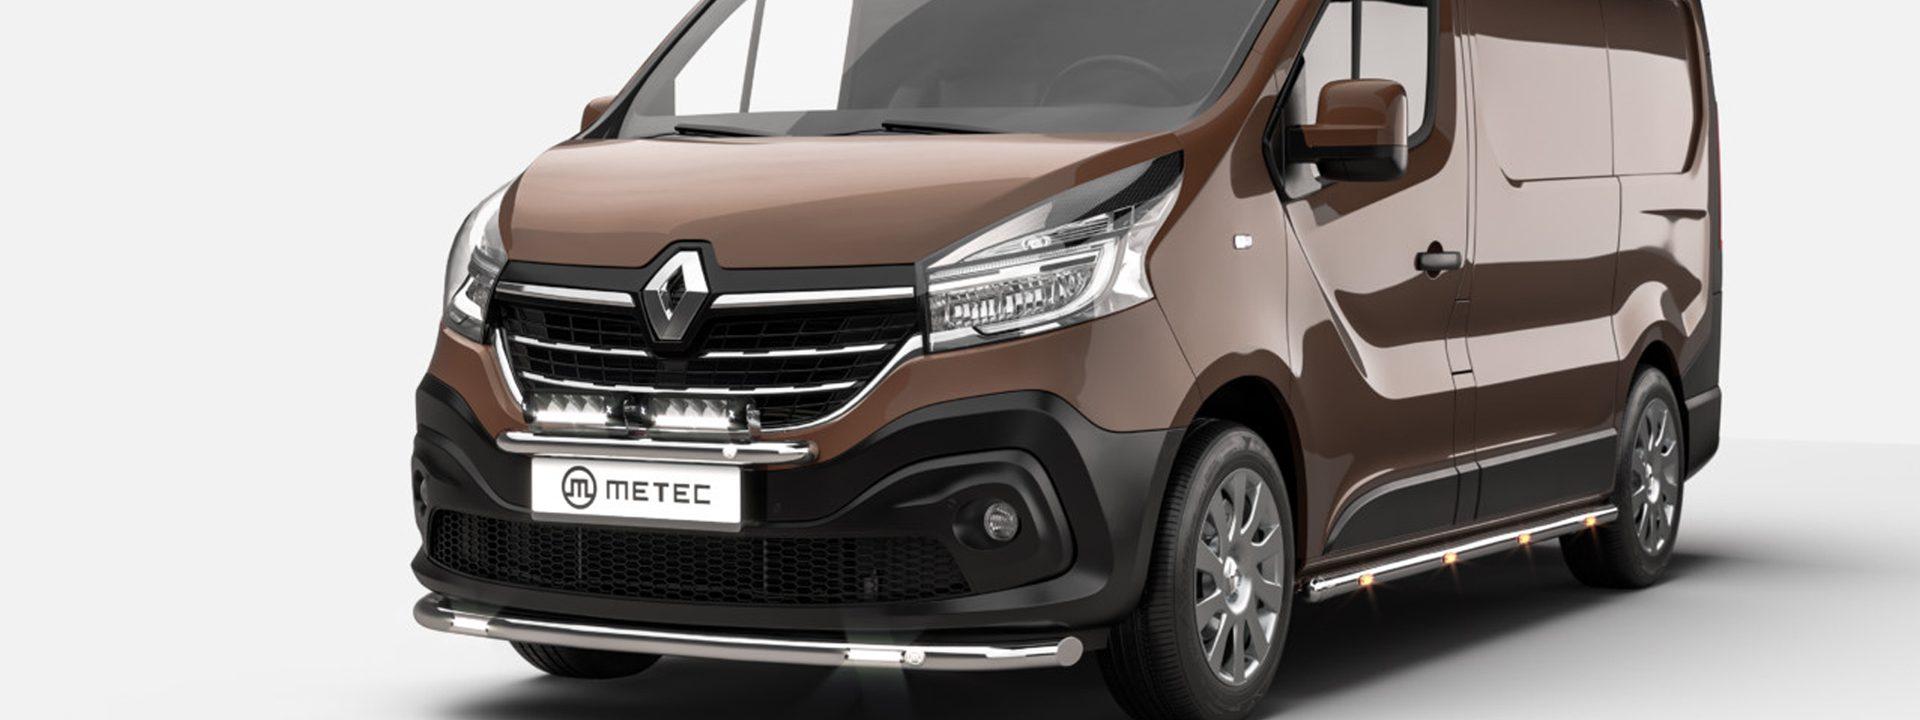 Renault Trafic med ny front bakgrundsbild